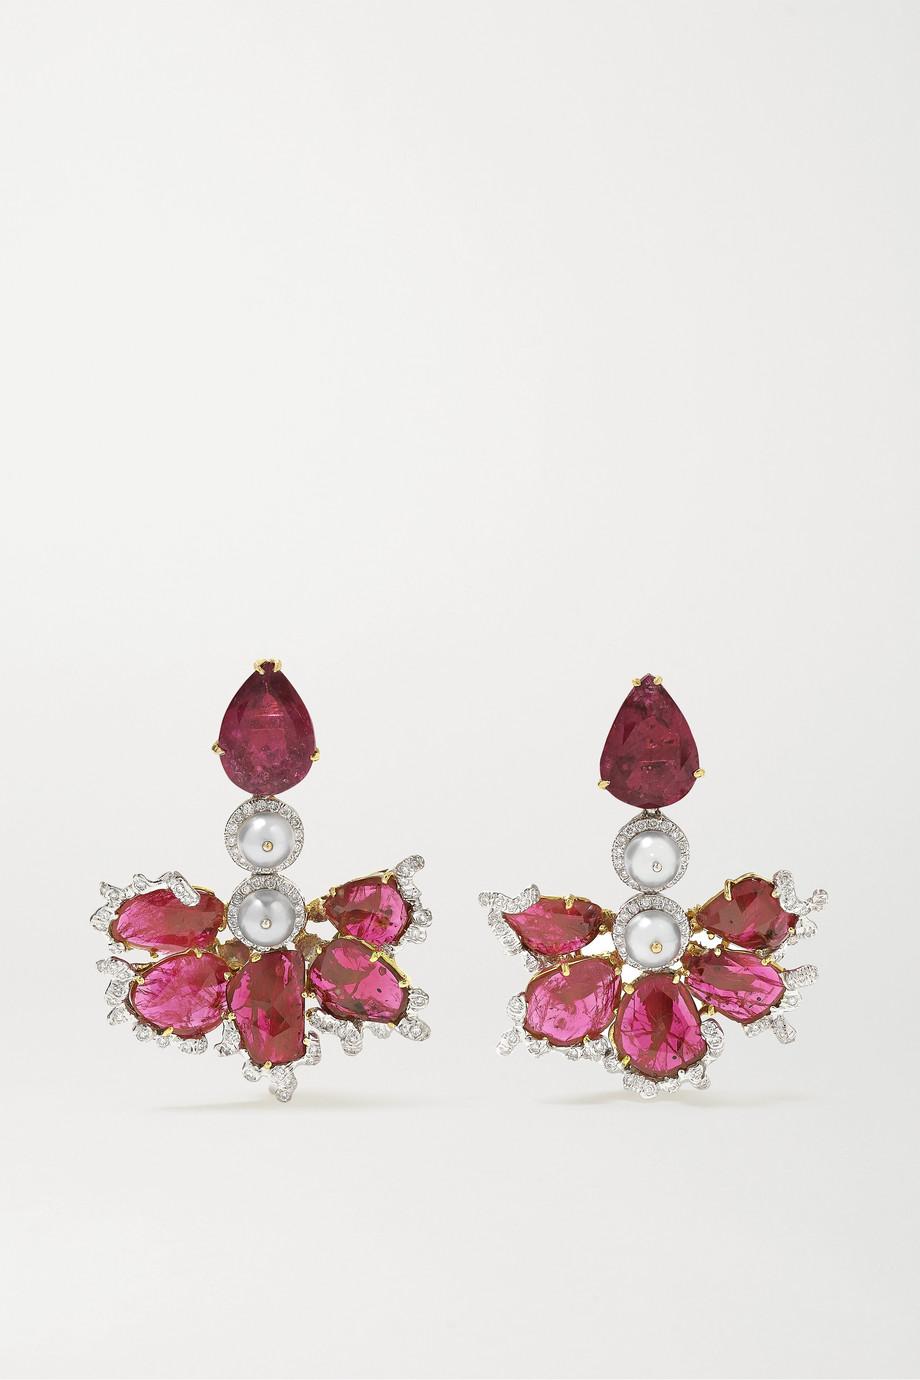 Bina Goenka 18-karat gold and rhodium-plated multi-stone earrings